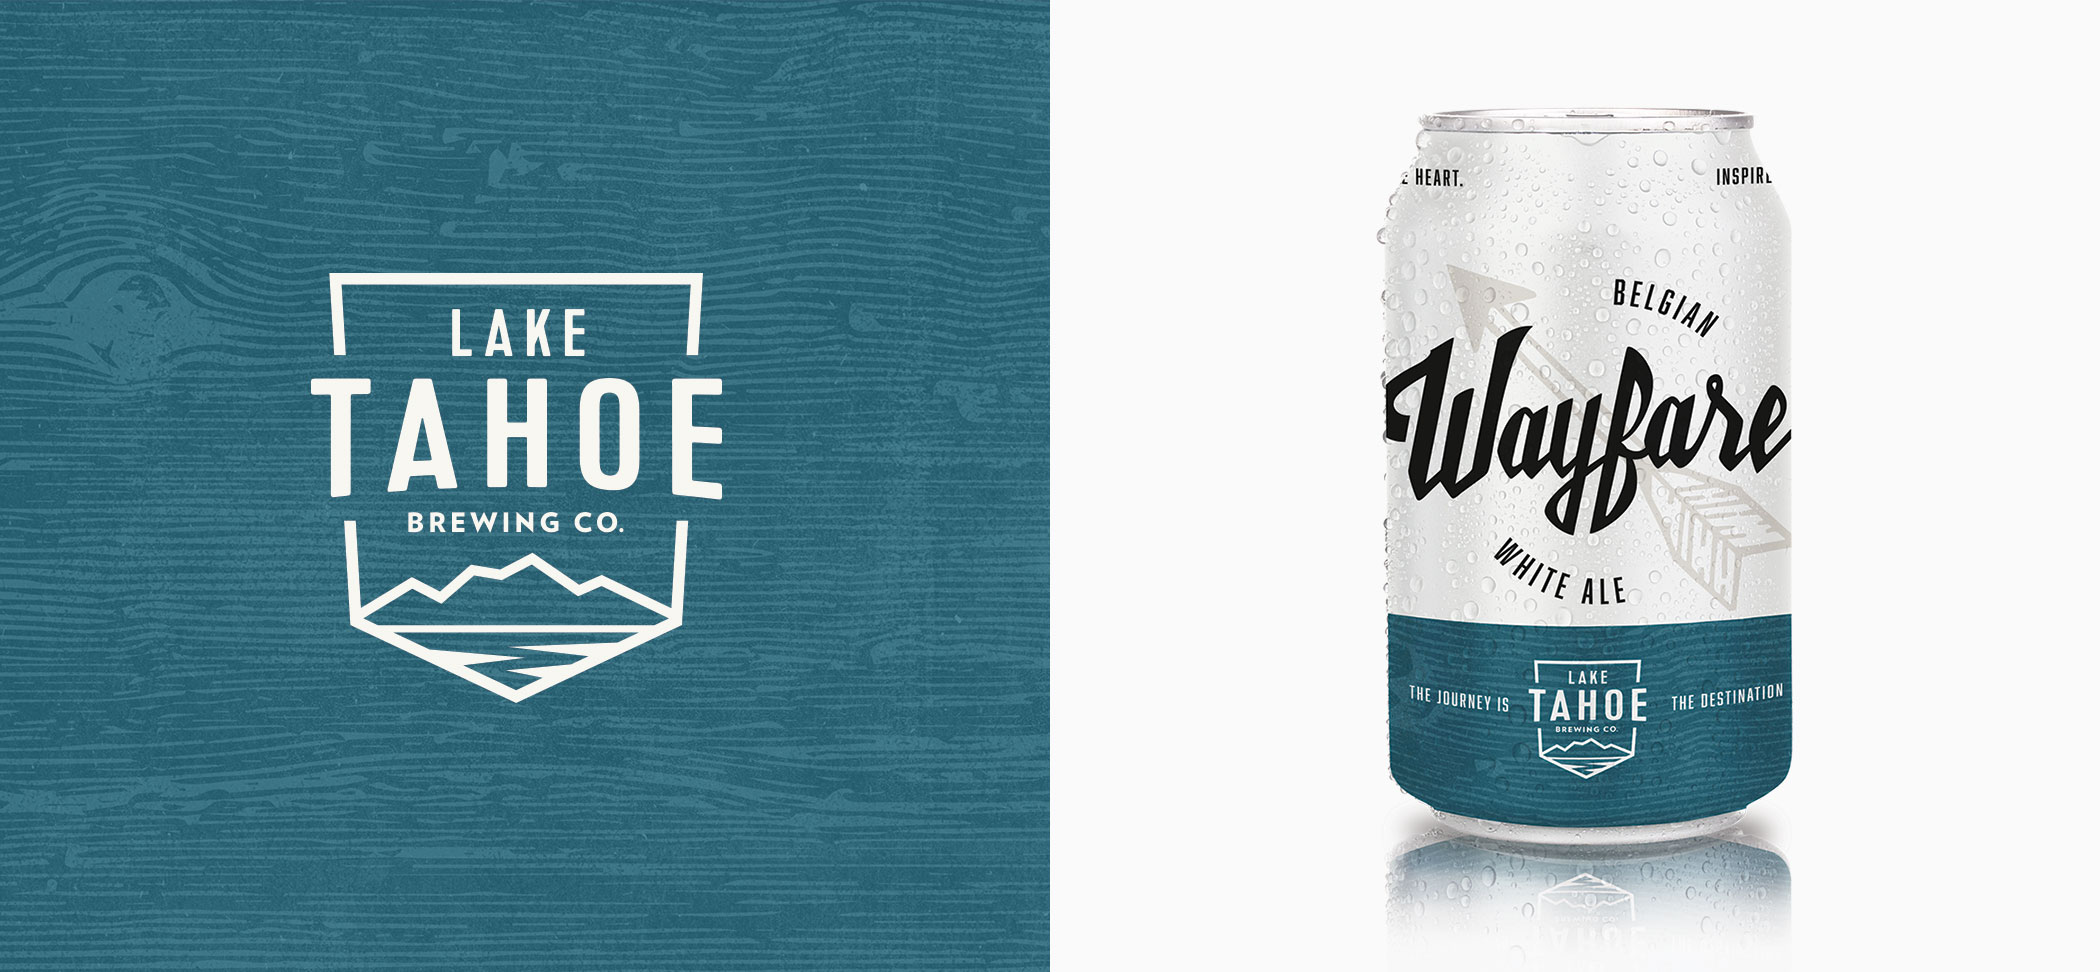 beer-can-design-reno-tahoe.jpg